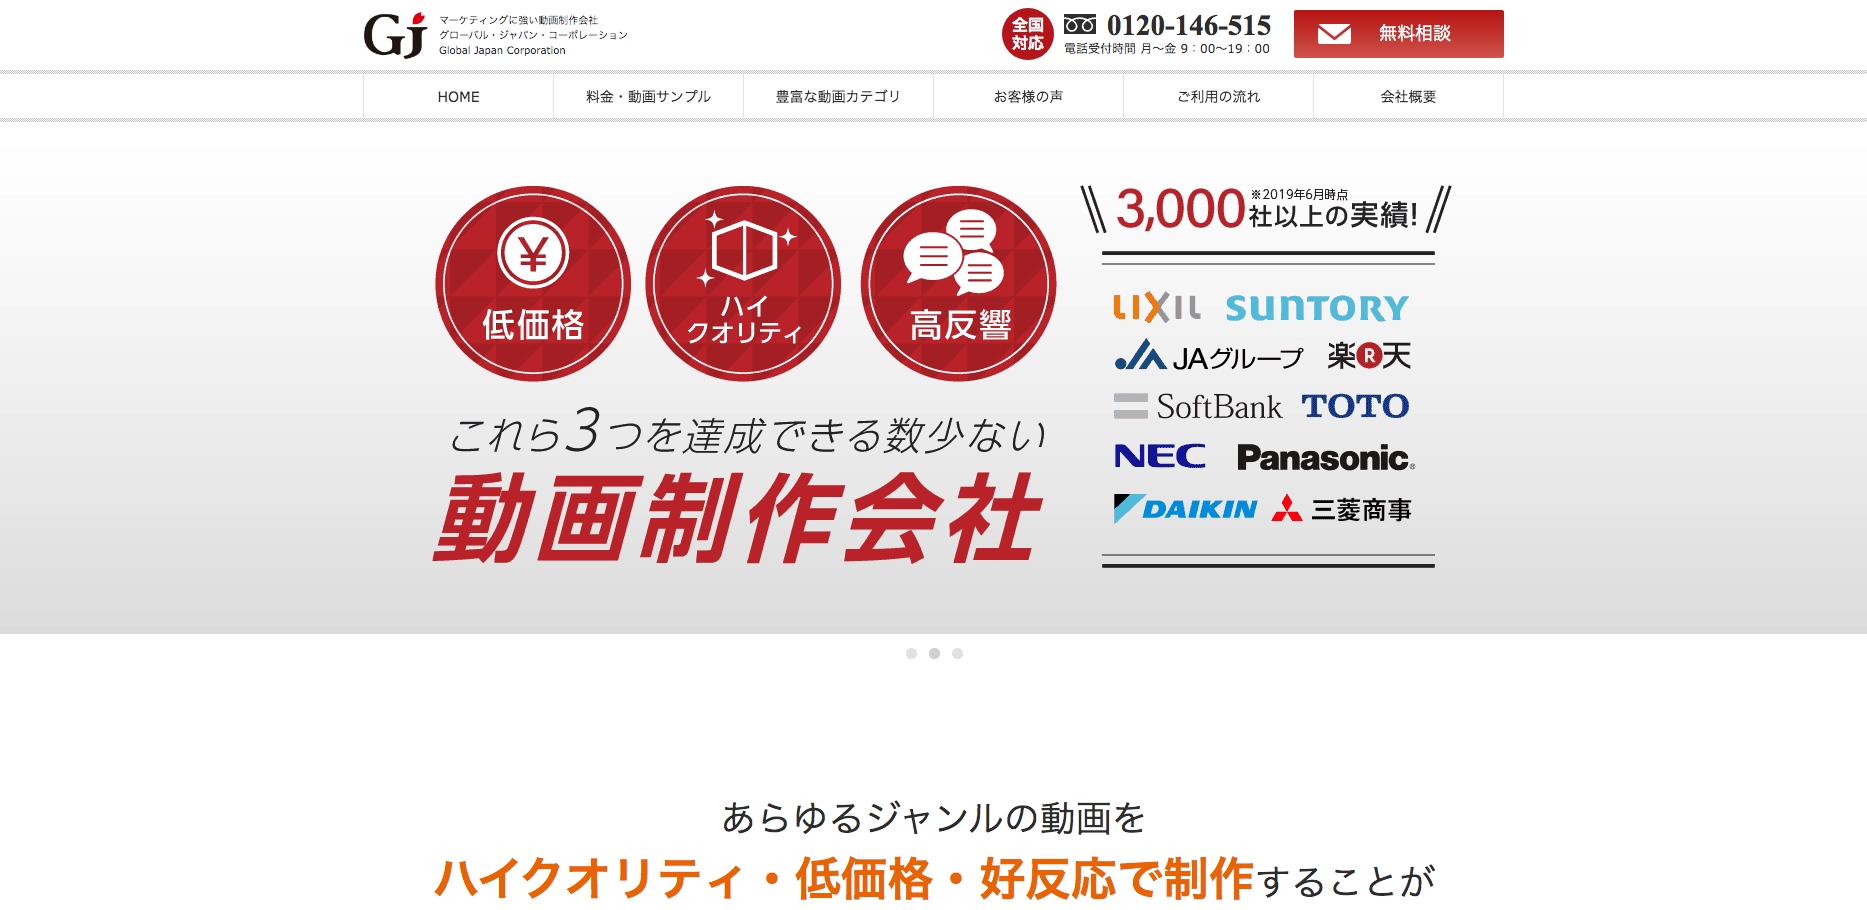 動画制作会社3:Global Japan Corporation